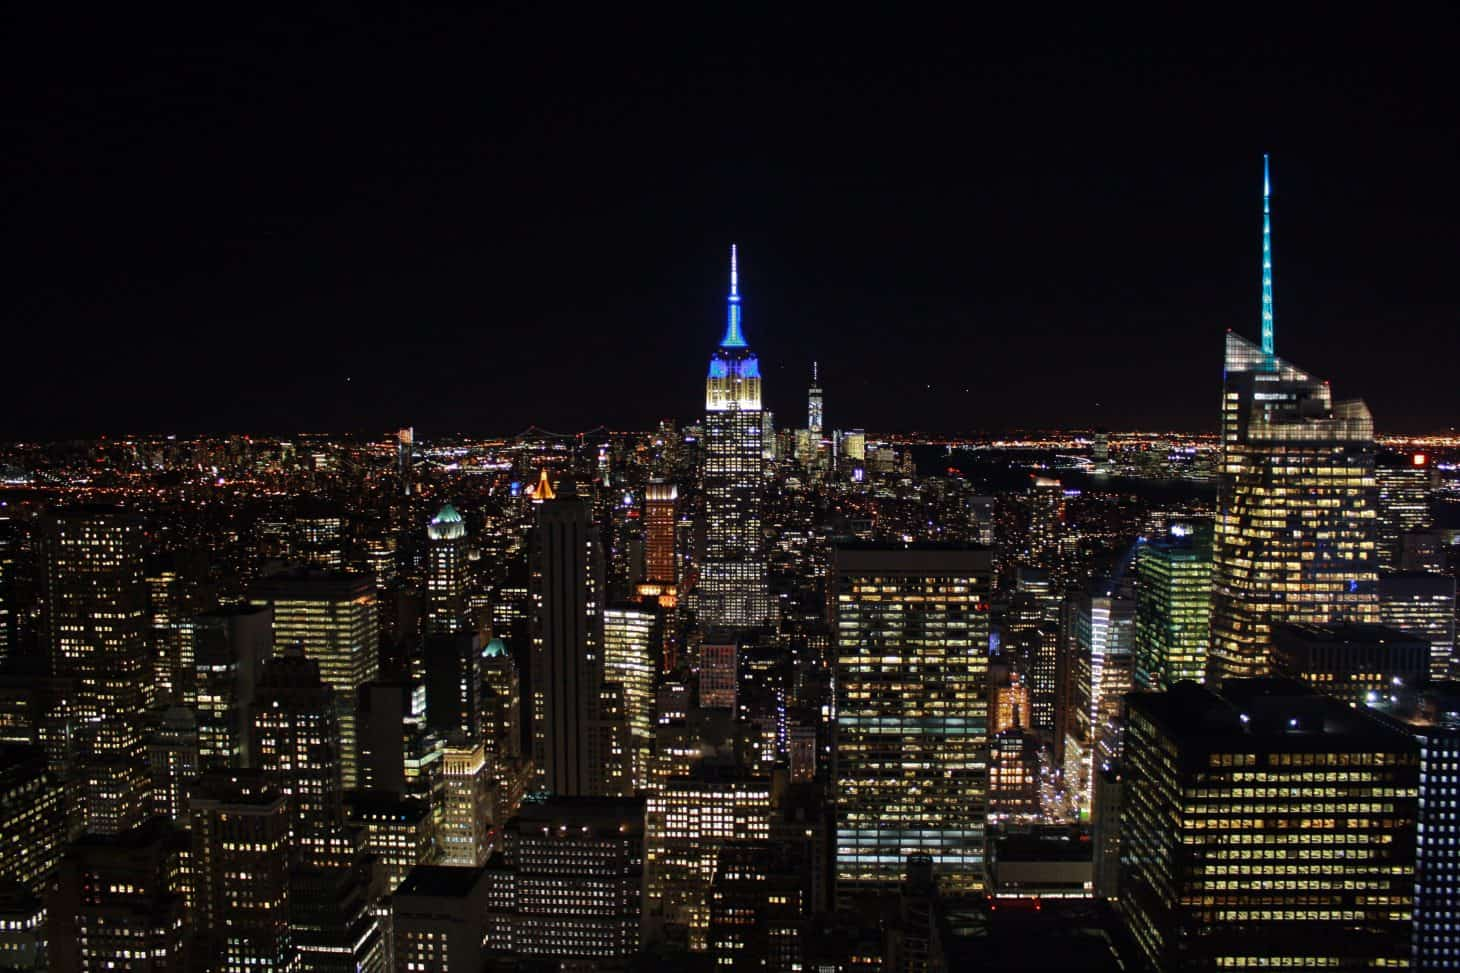 New York skyline at night from the Rockefeller Centre